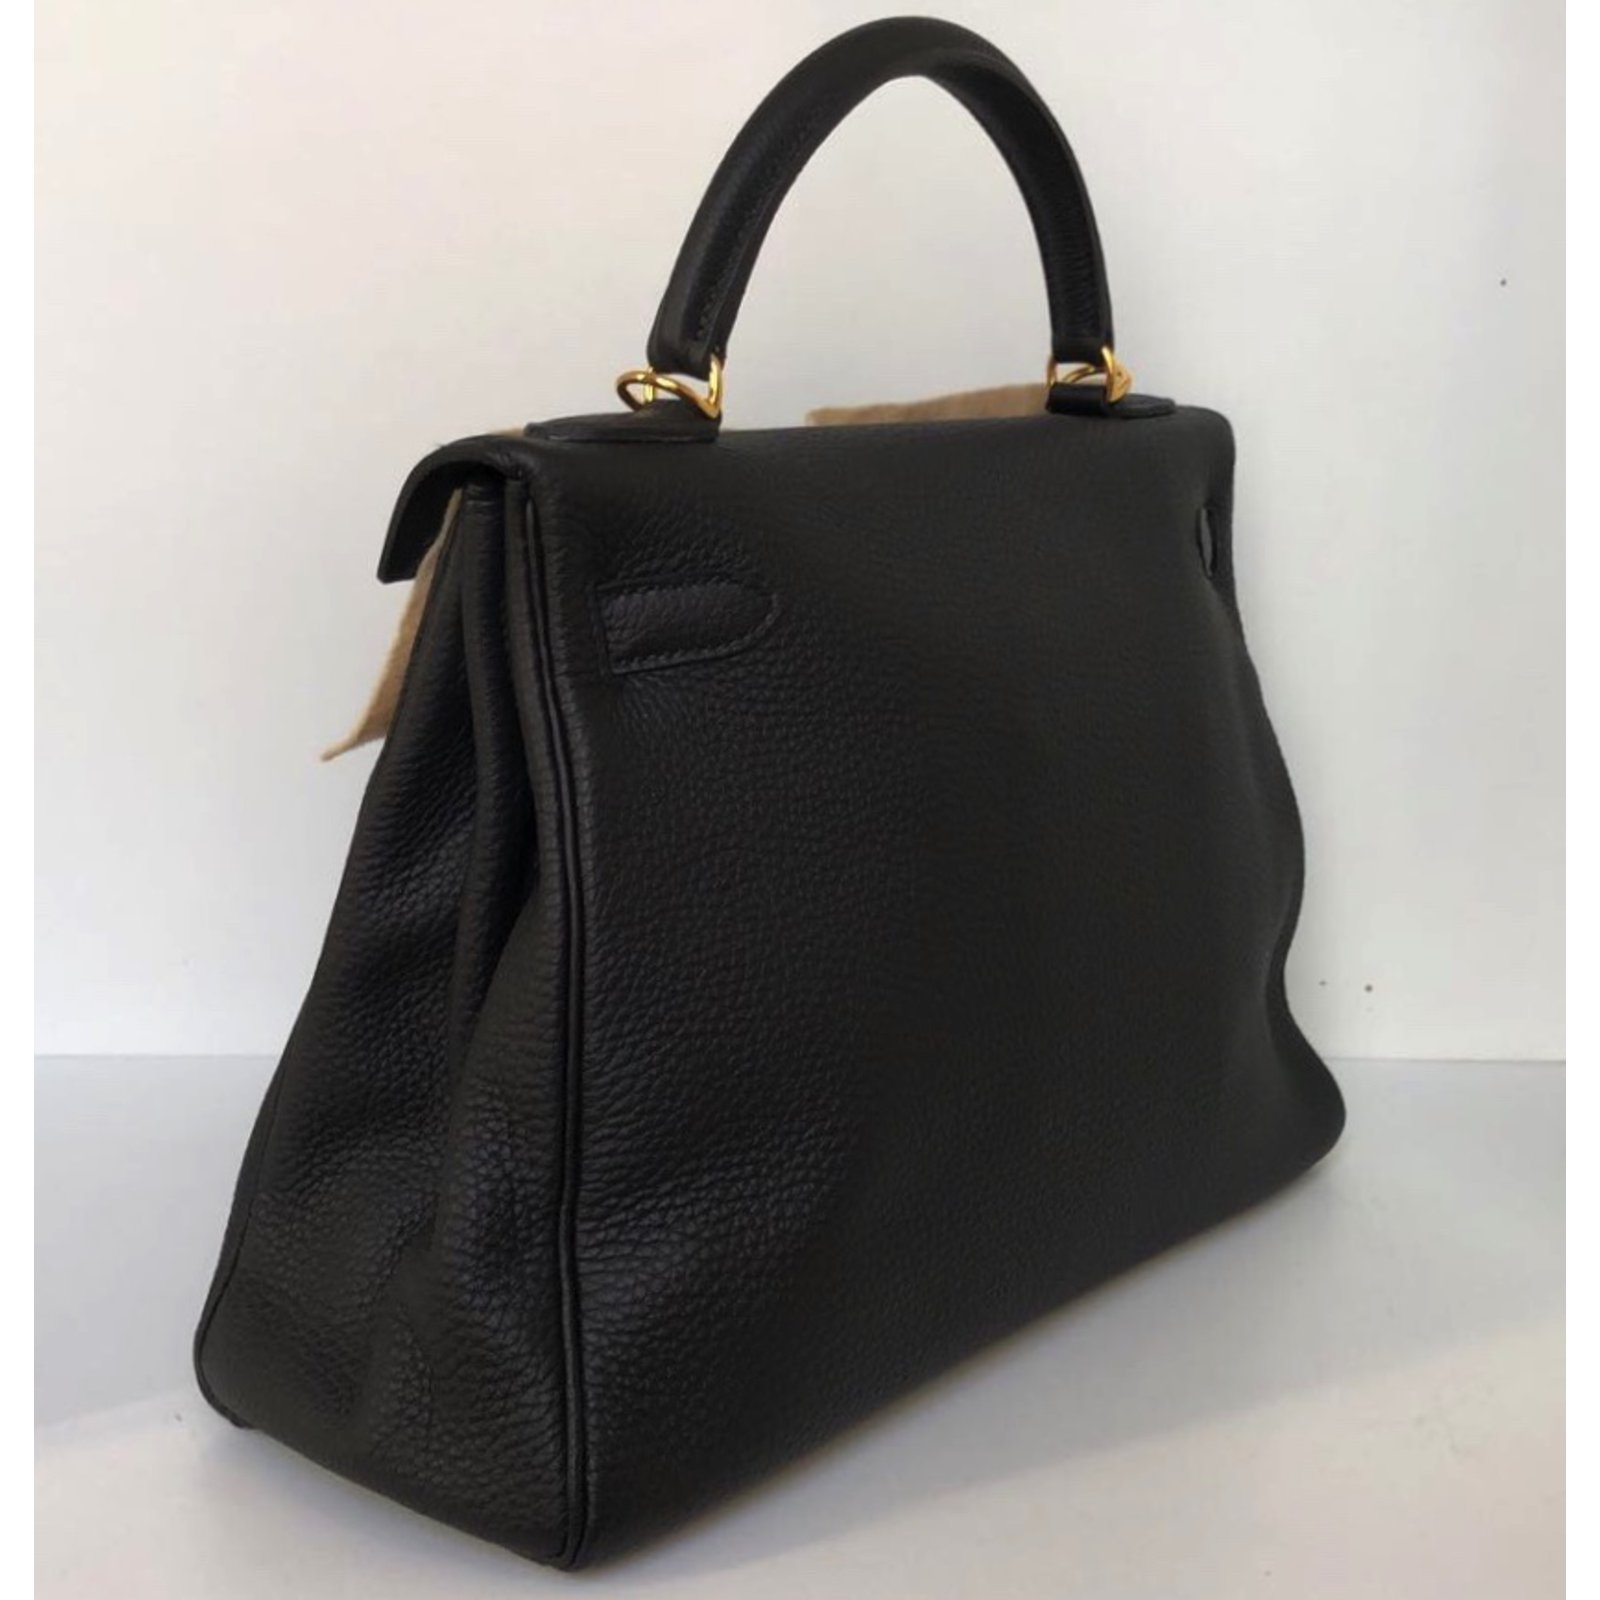 89a3bc5a2fe7 Hermès Kelly 32 Handbags Leather Black ref.76124 - Joli Closet